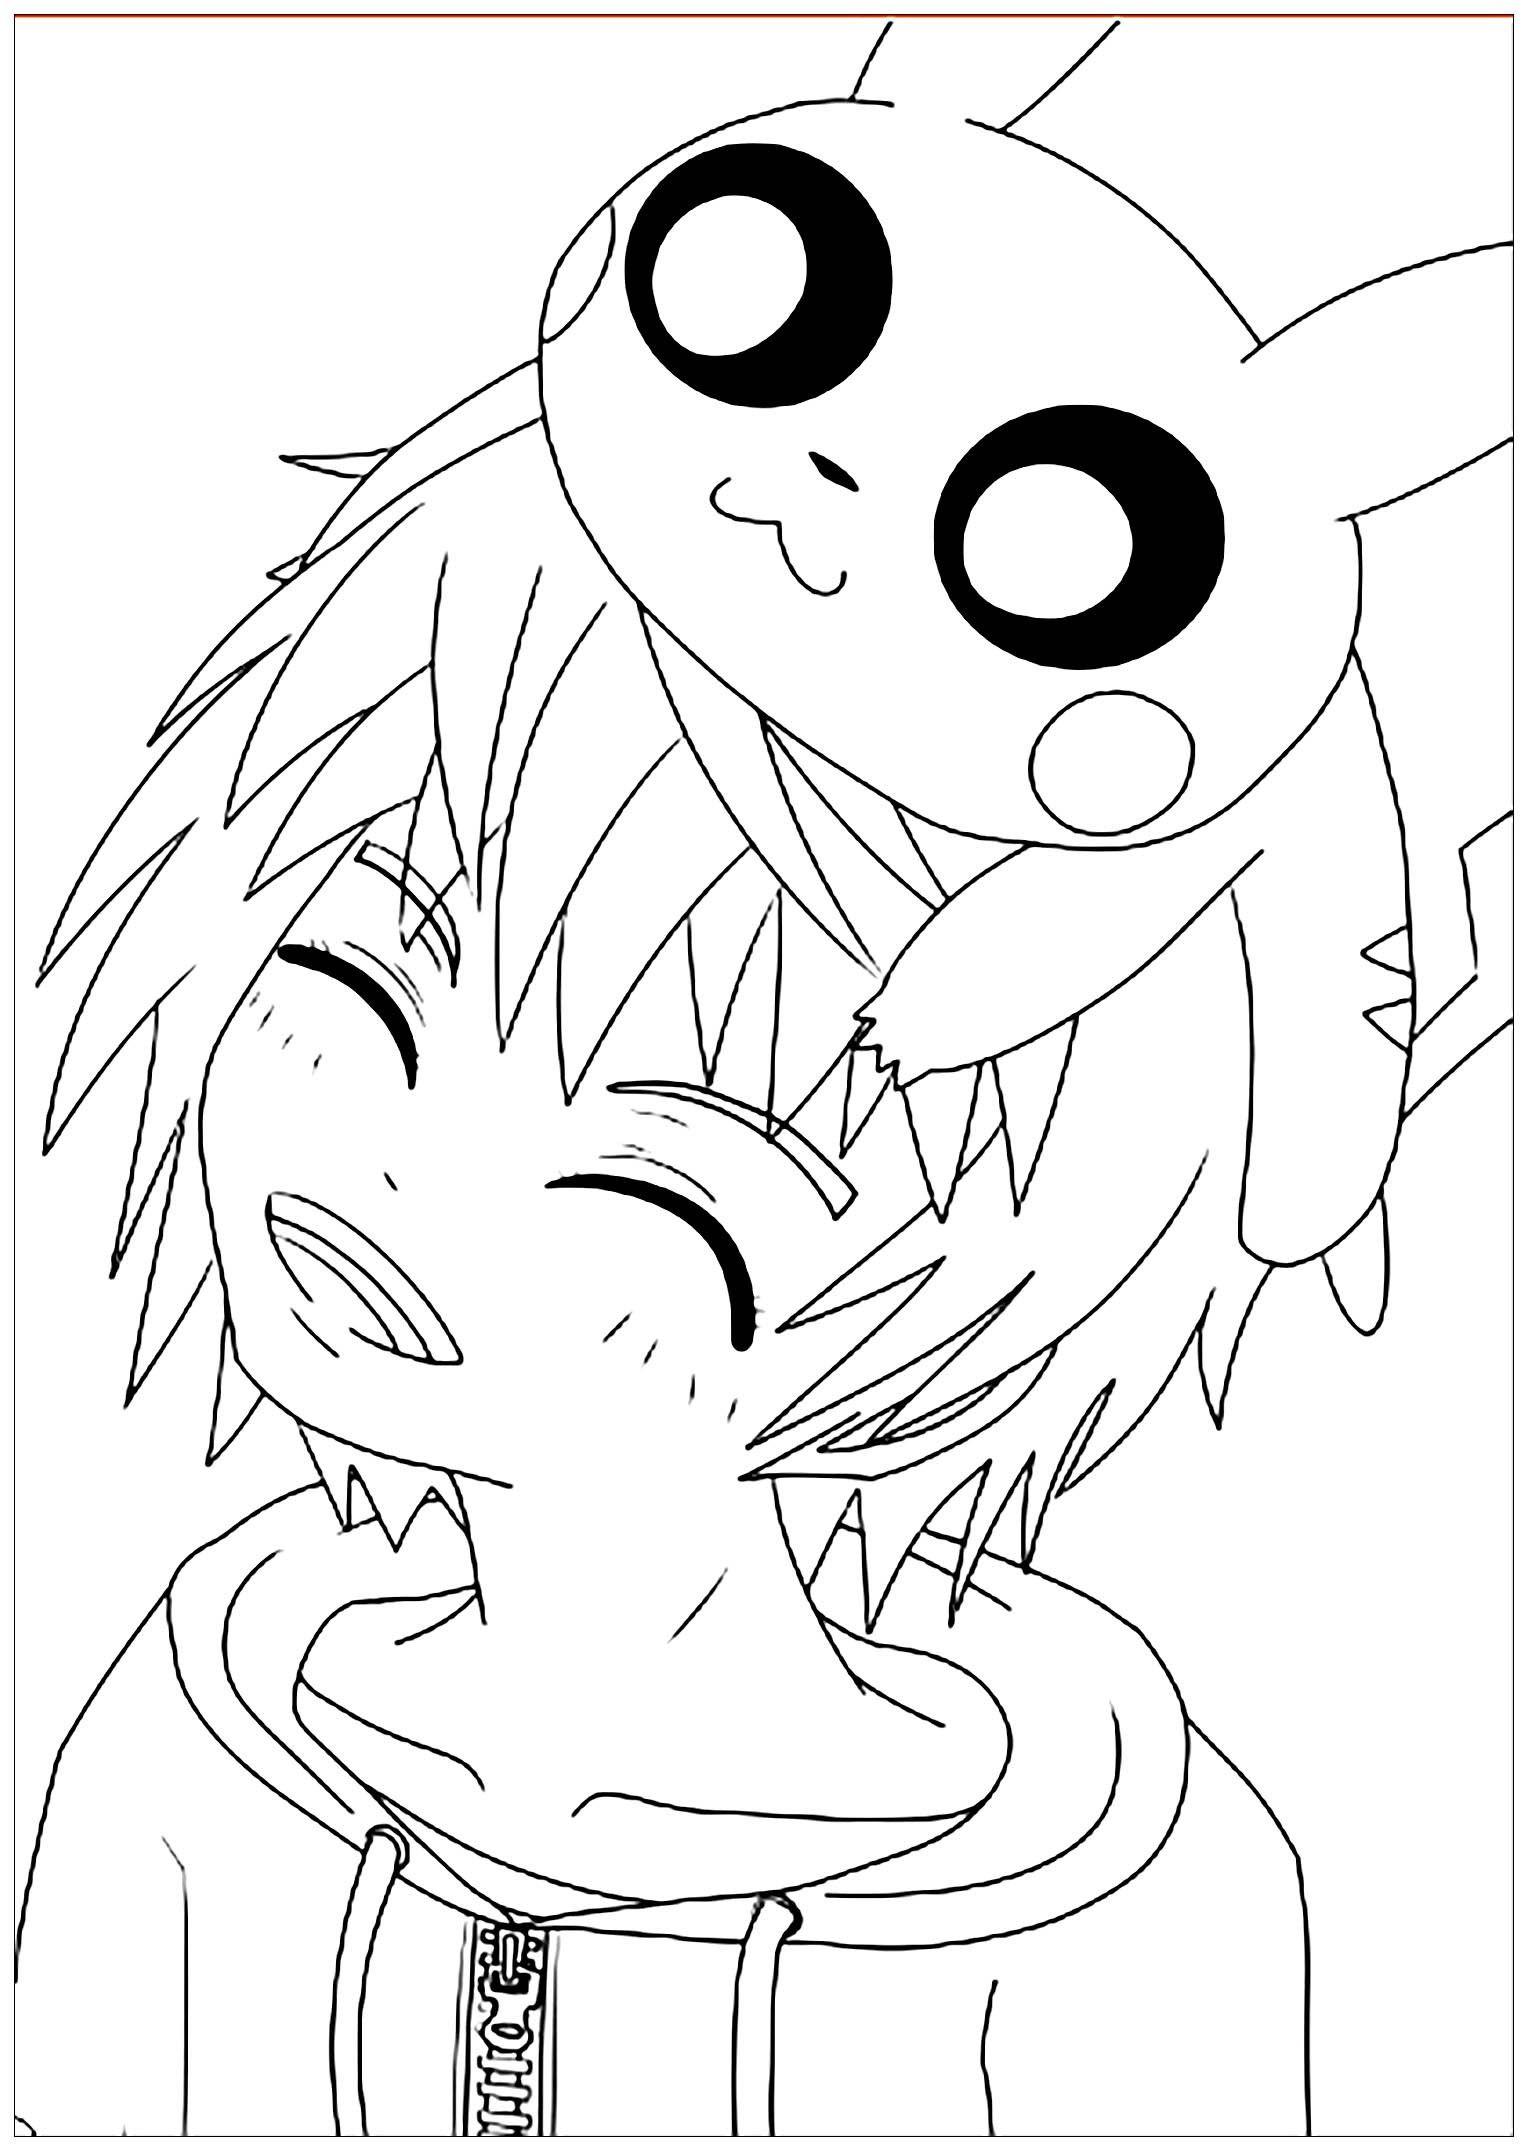 Nouveau Coloriage De Grand Garcon Avec Coloriage Kawaii Pikachu Et Coloriage Kawaii Coloriage Manga Dessin Kawaii